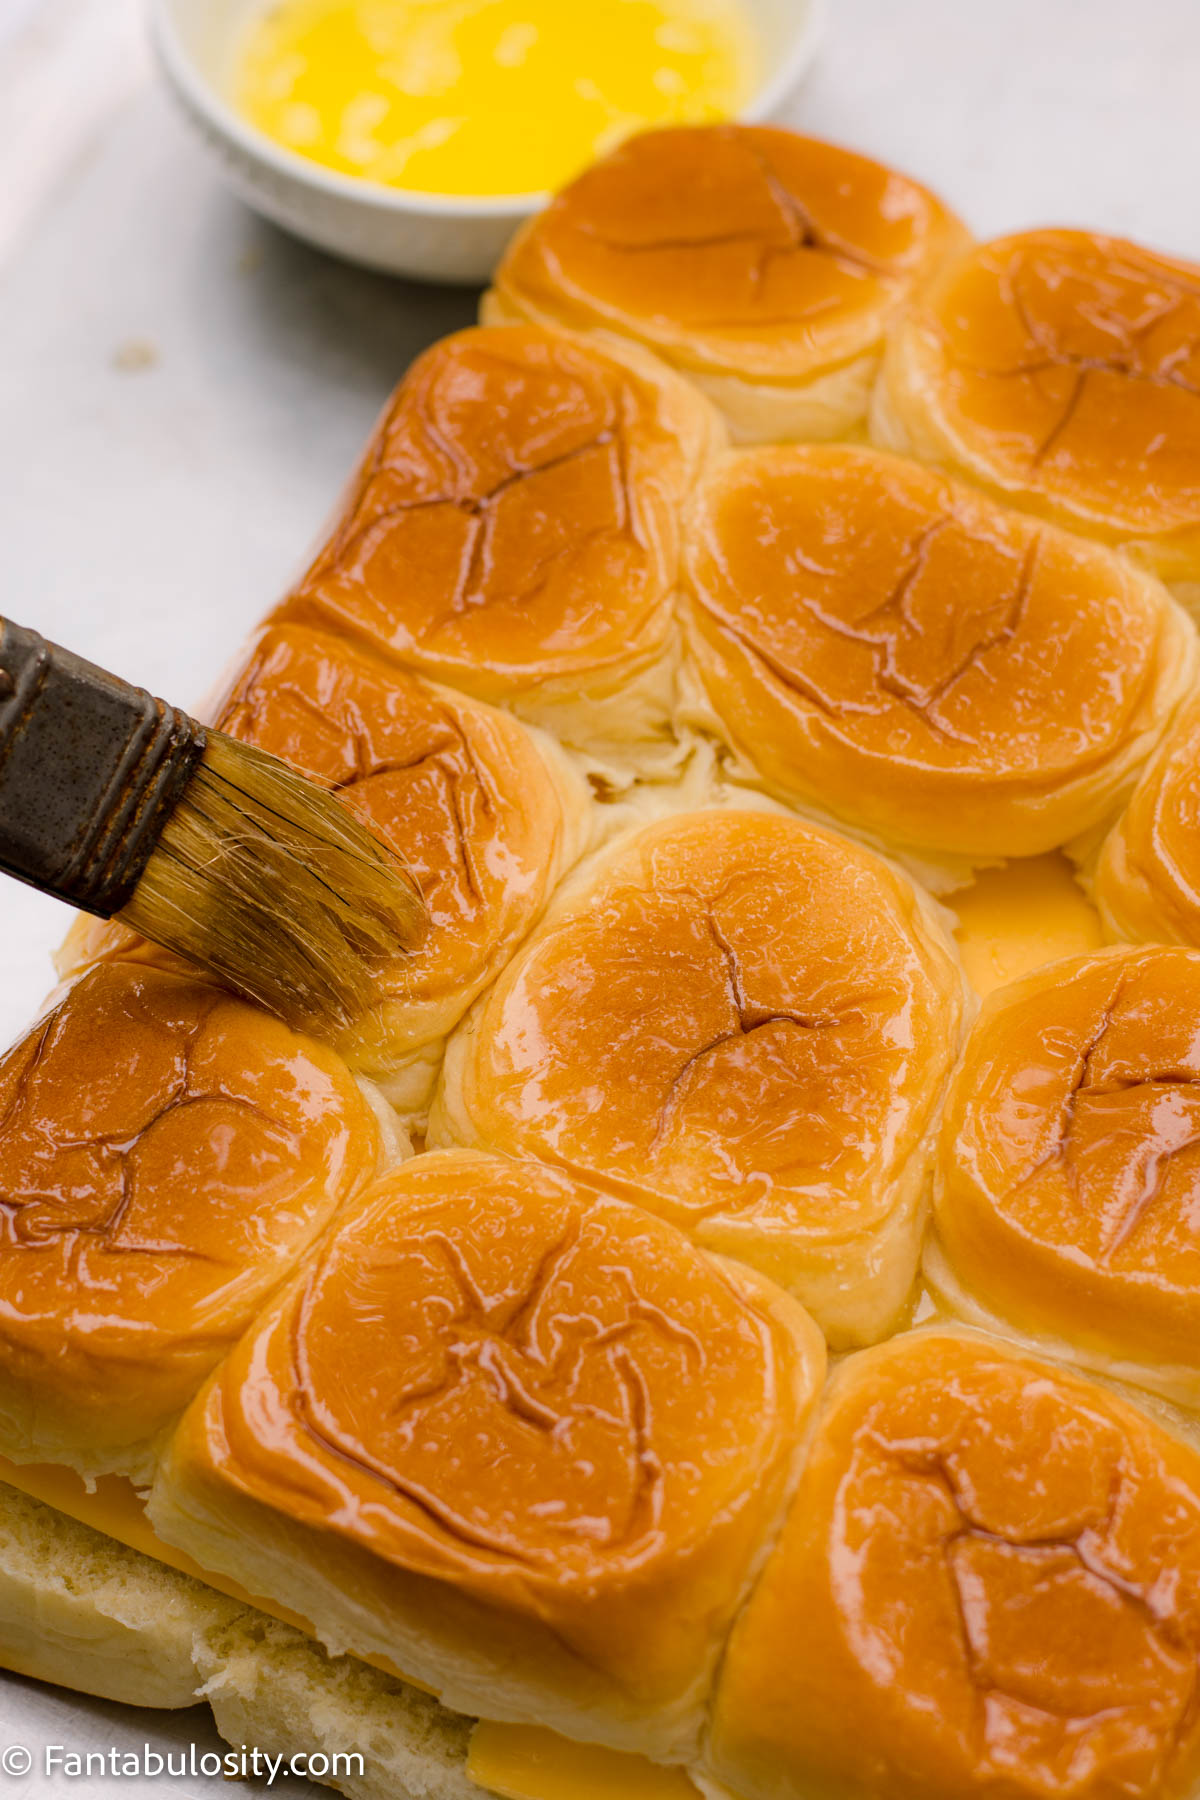 Brush garlic cutter on top of rolls